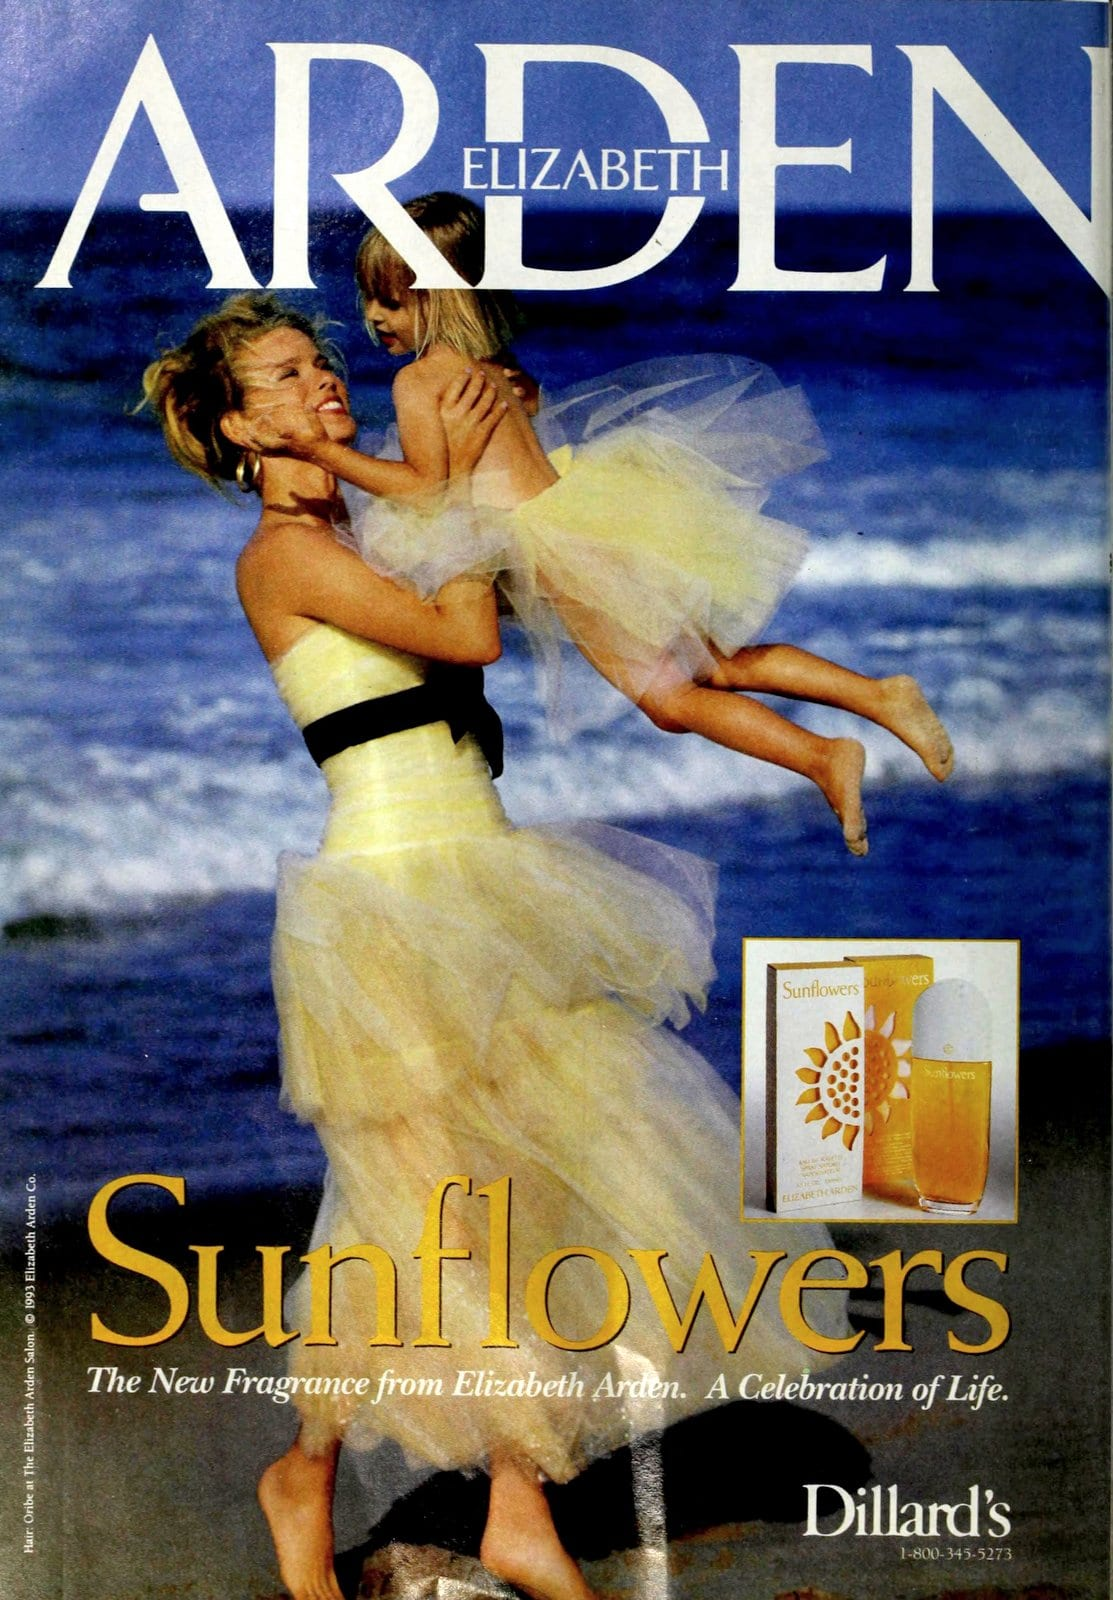 Sunflowers vintage fragrance from Elizabeth Arden (1993) at ClickAmericana.com